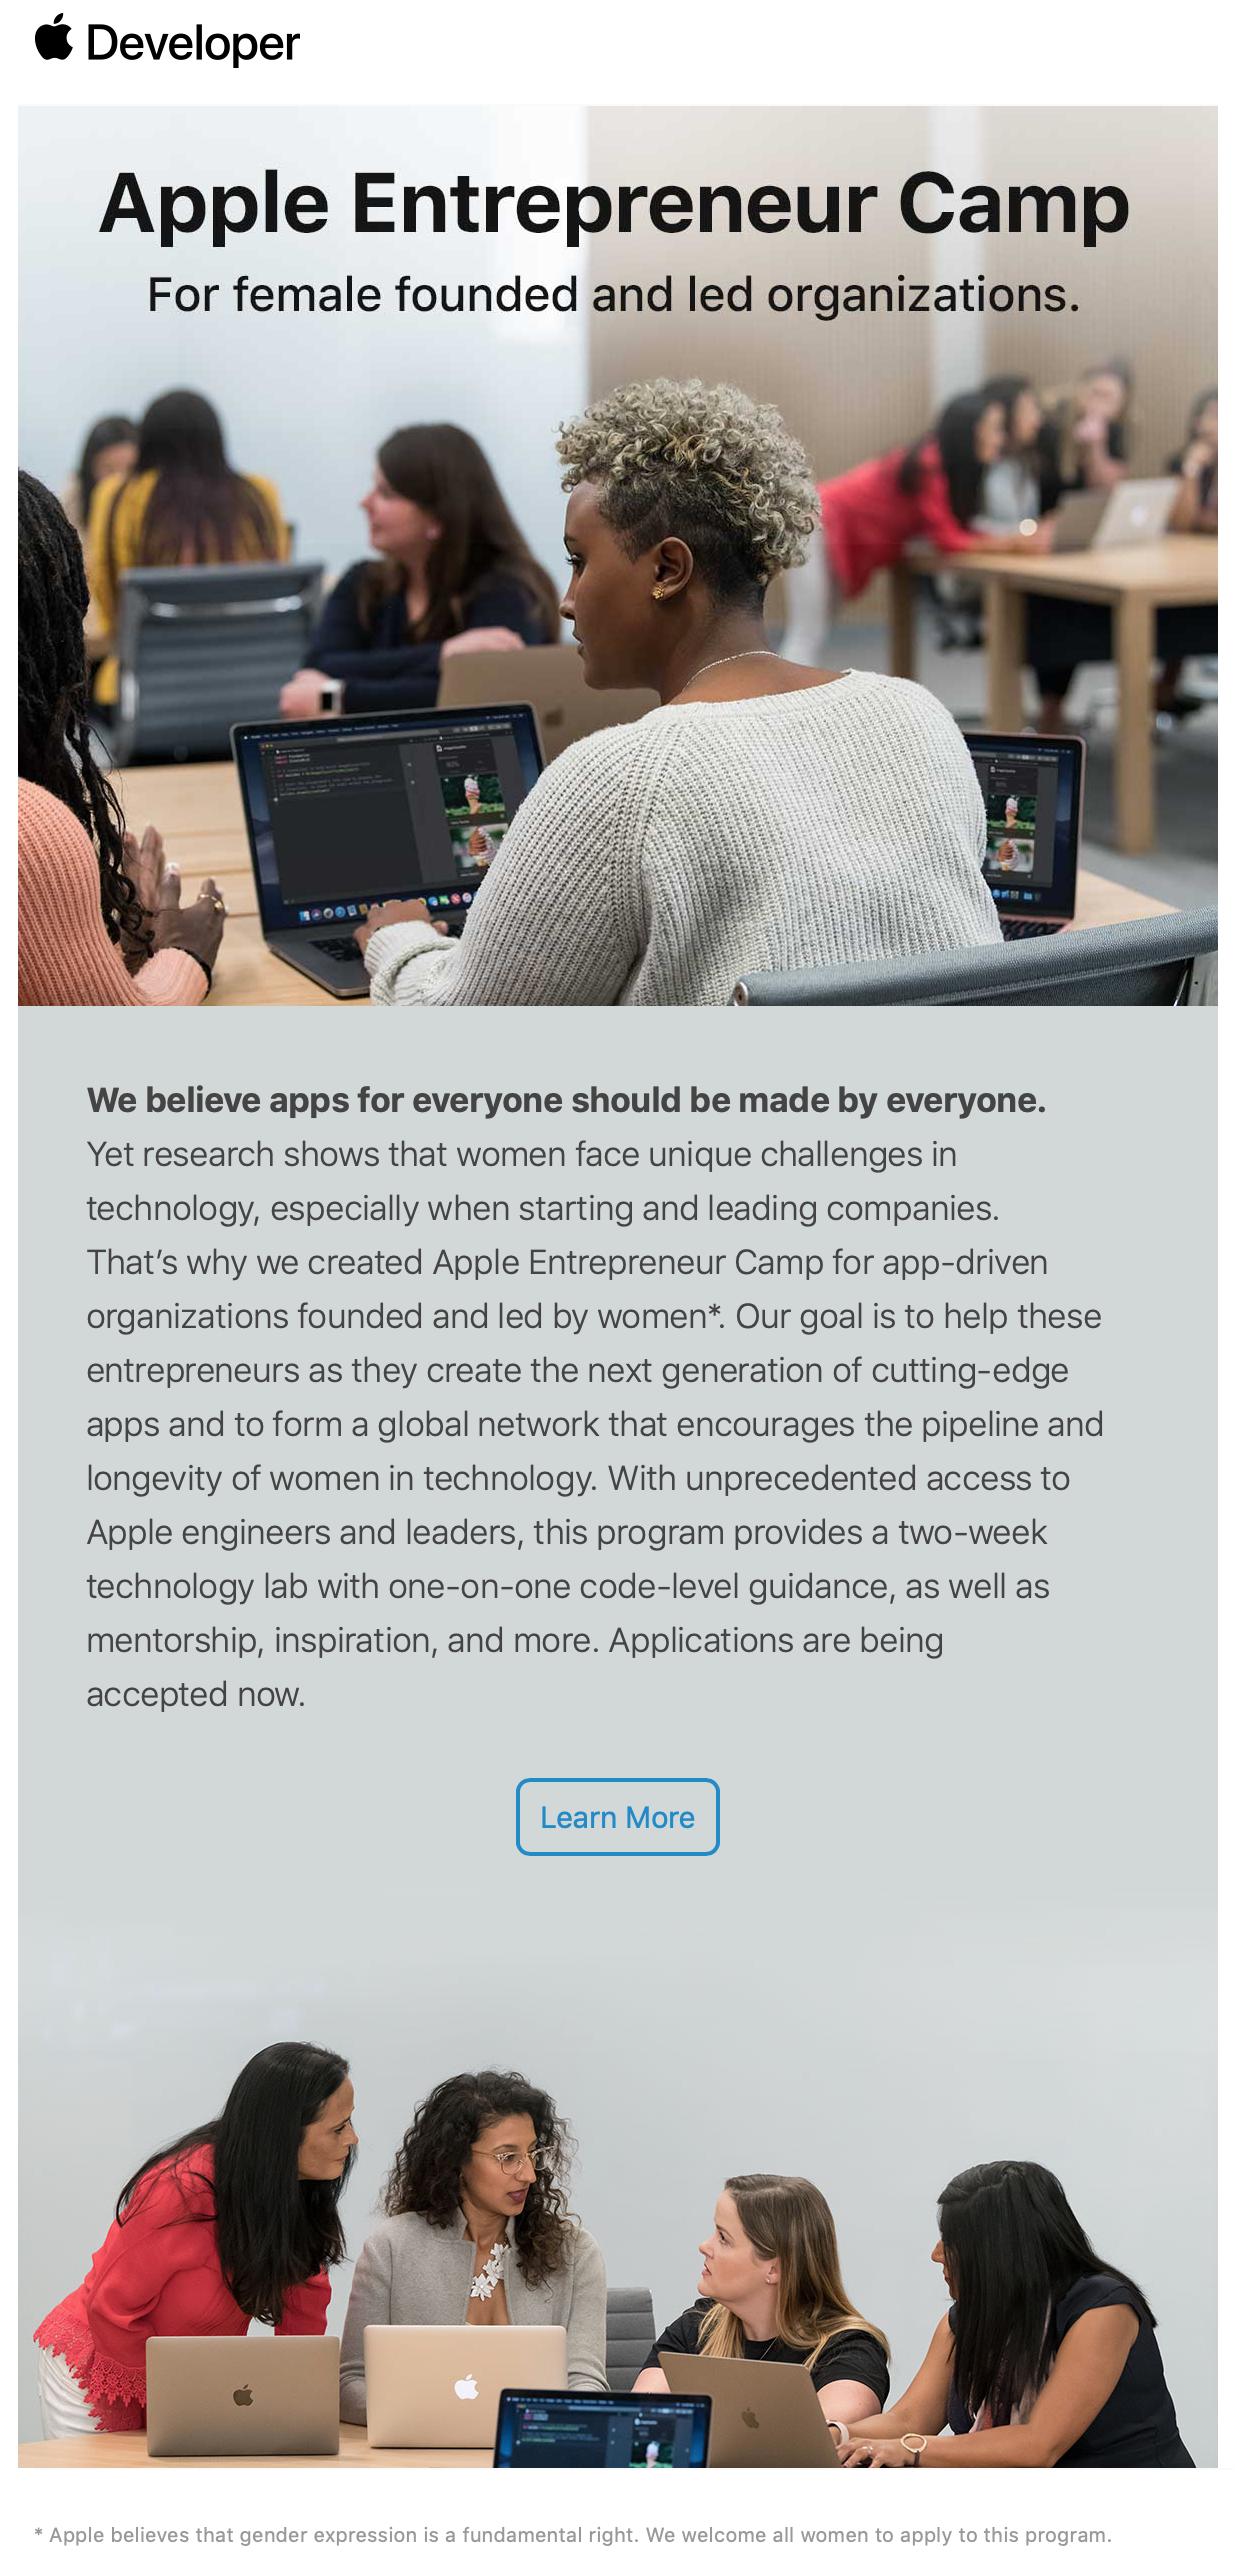 AppleEntrepreneurCamp.png